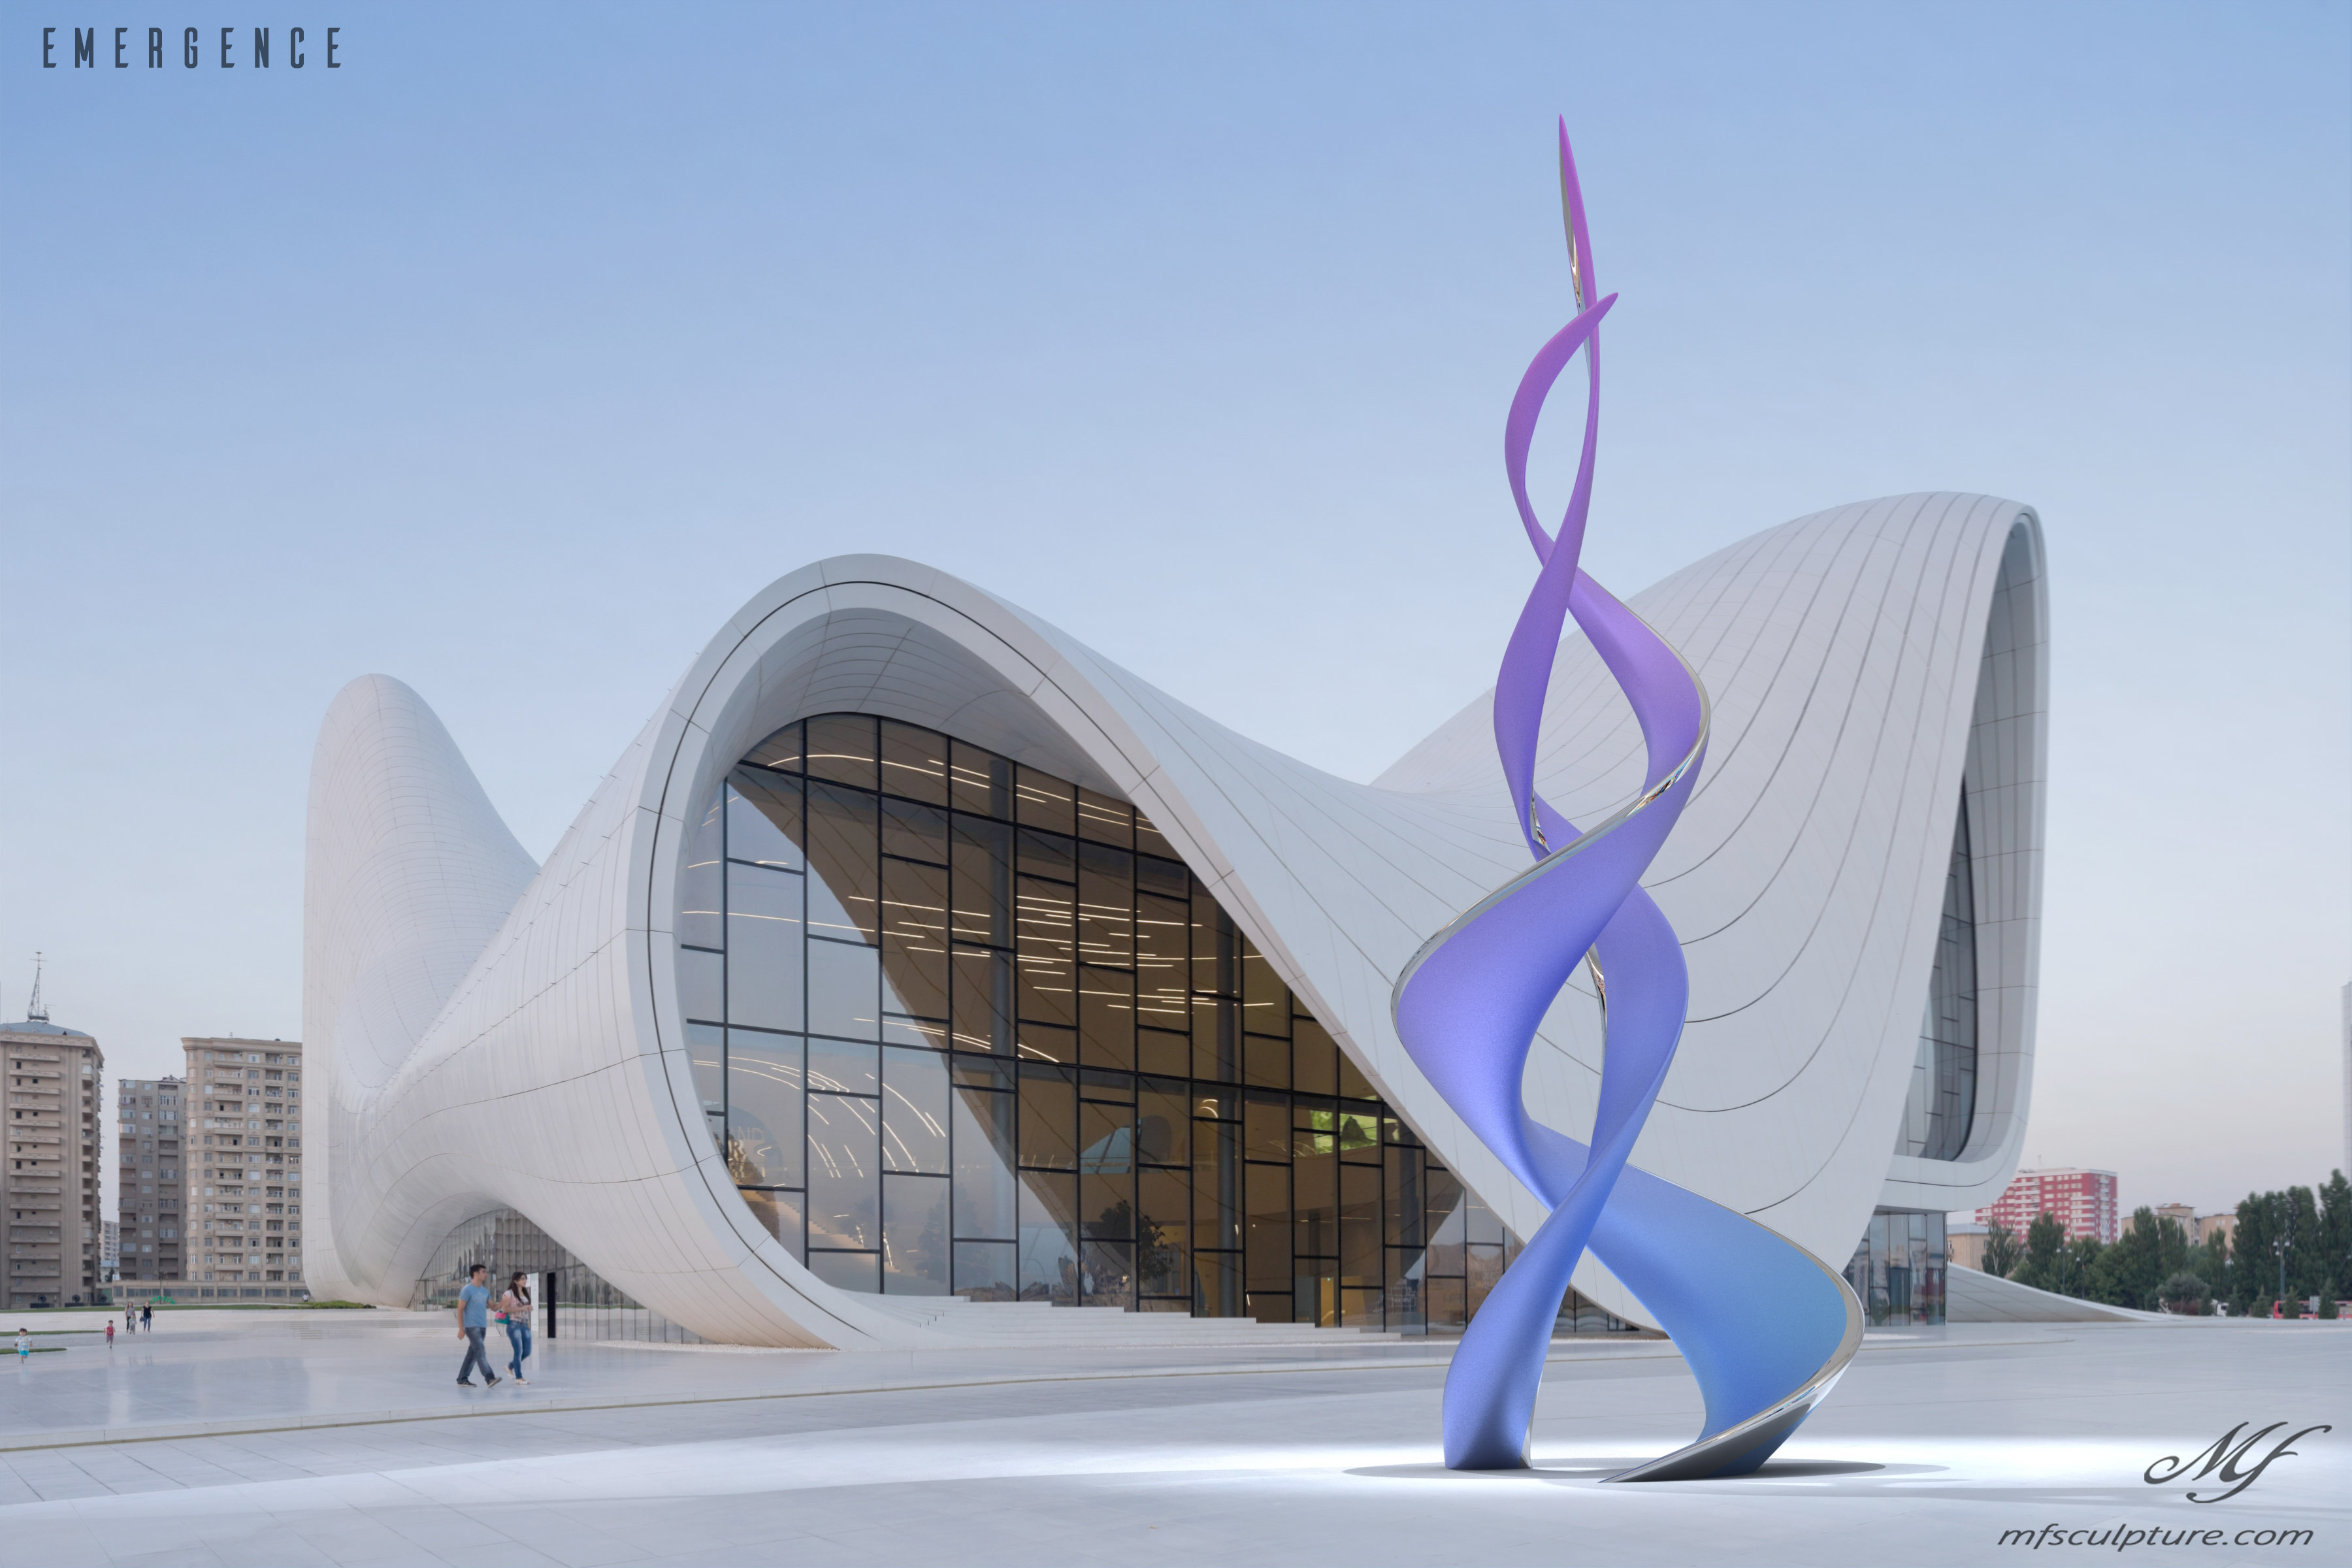 Heydar aliyev center baku zaha hadid Unity Modern Sculpture Emergence Monument 3